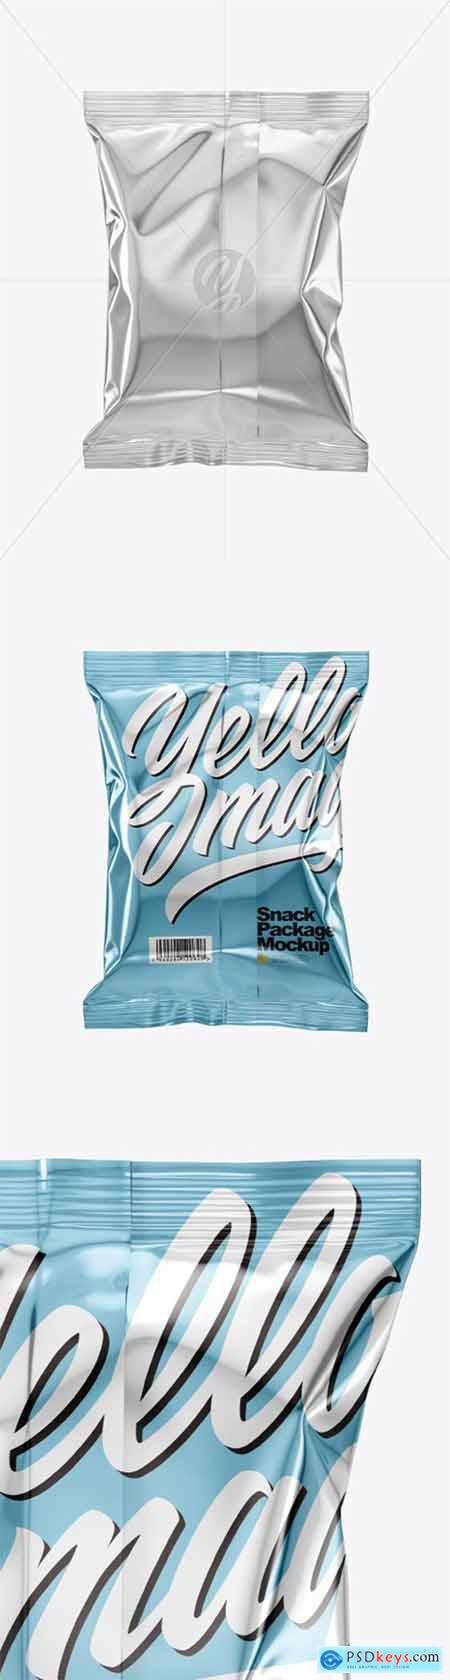 Metallic Snack Package Mockup - Back View 50597